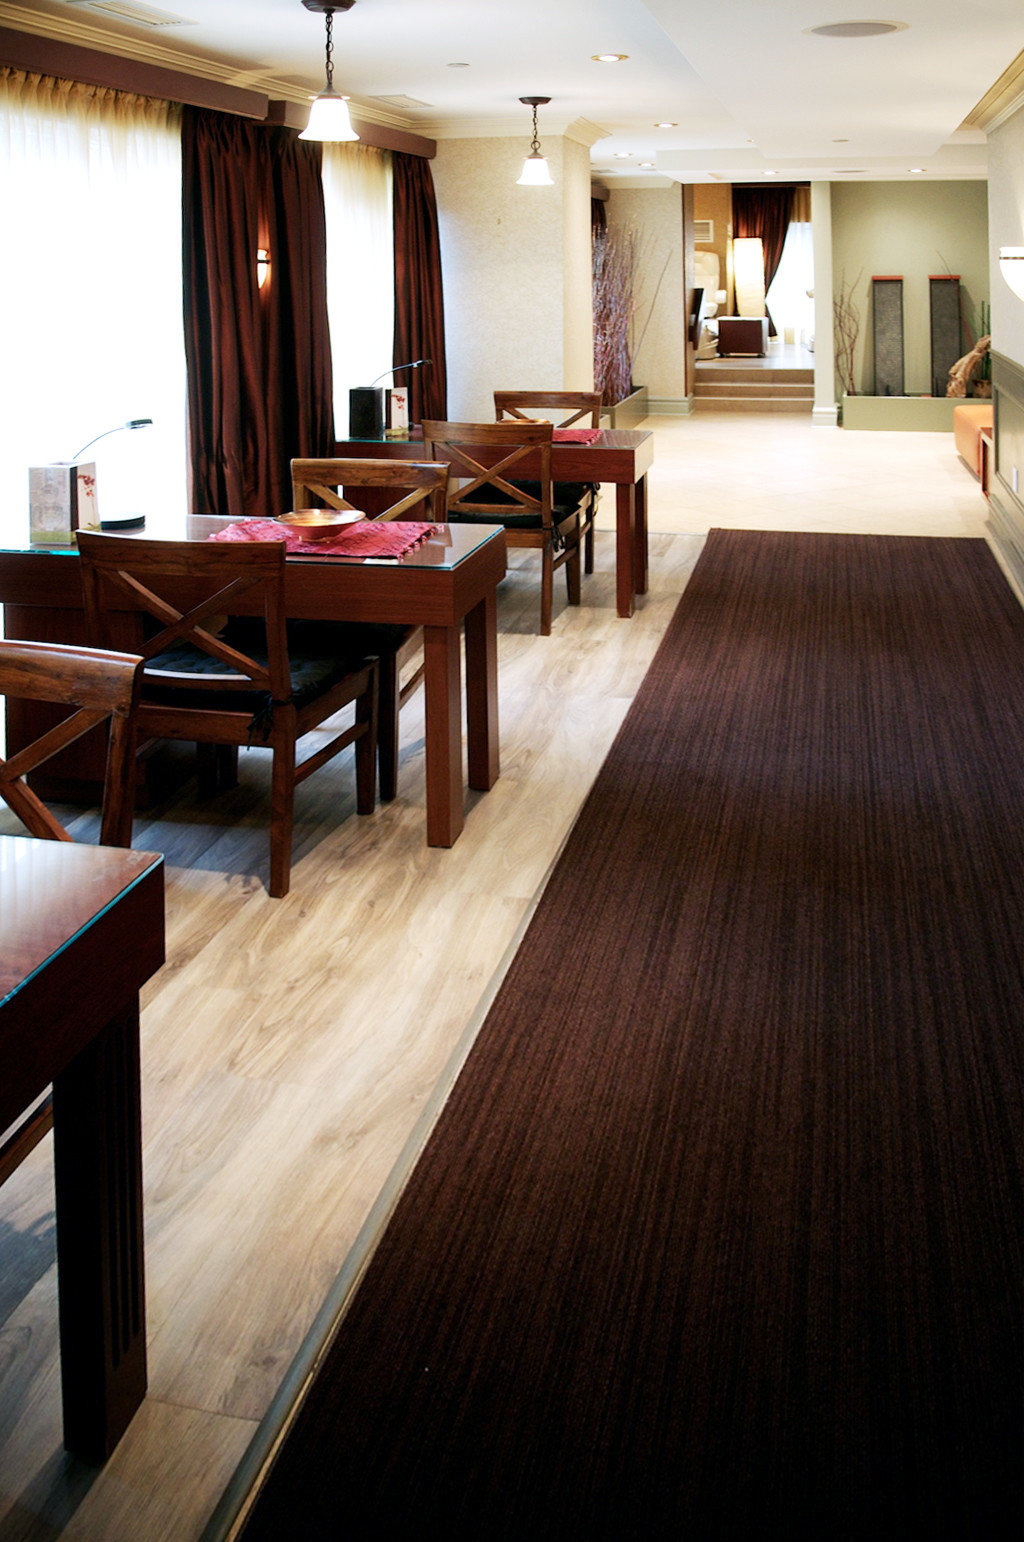 Budget City Dining Drink Eat Modern flooring hardwood wood flooring recreation room laminate flooring